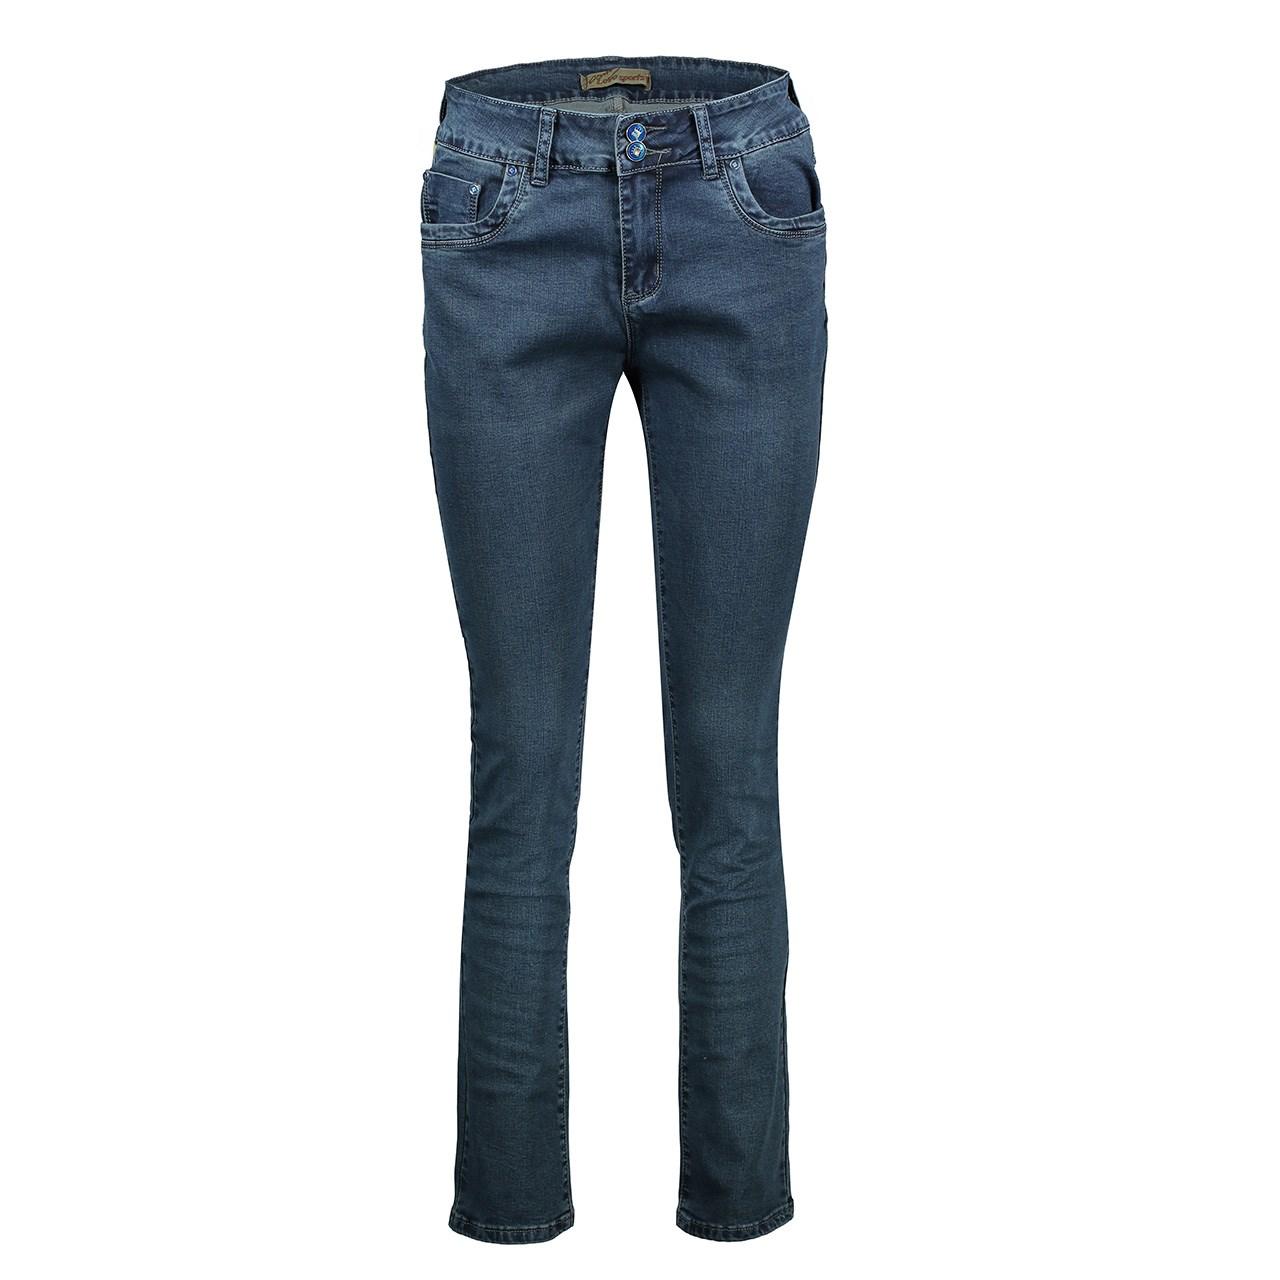 شلوار جین زنانه لاو اسپرت مدل L6628B